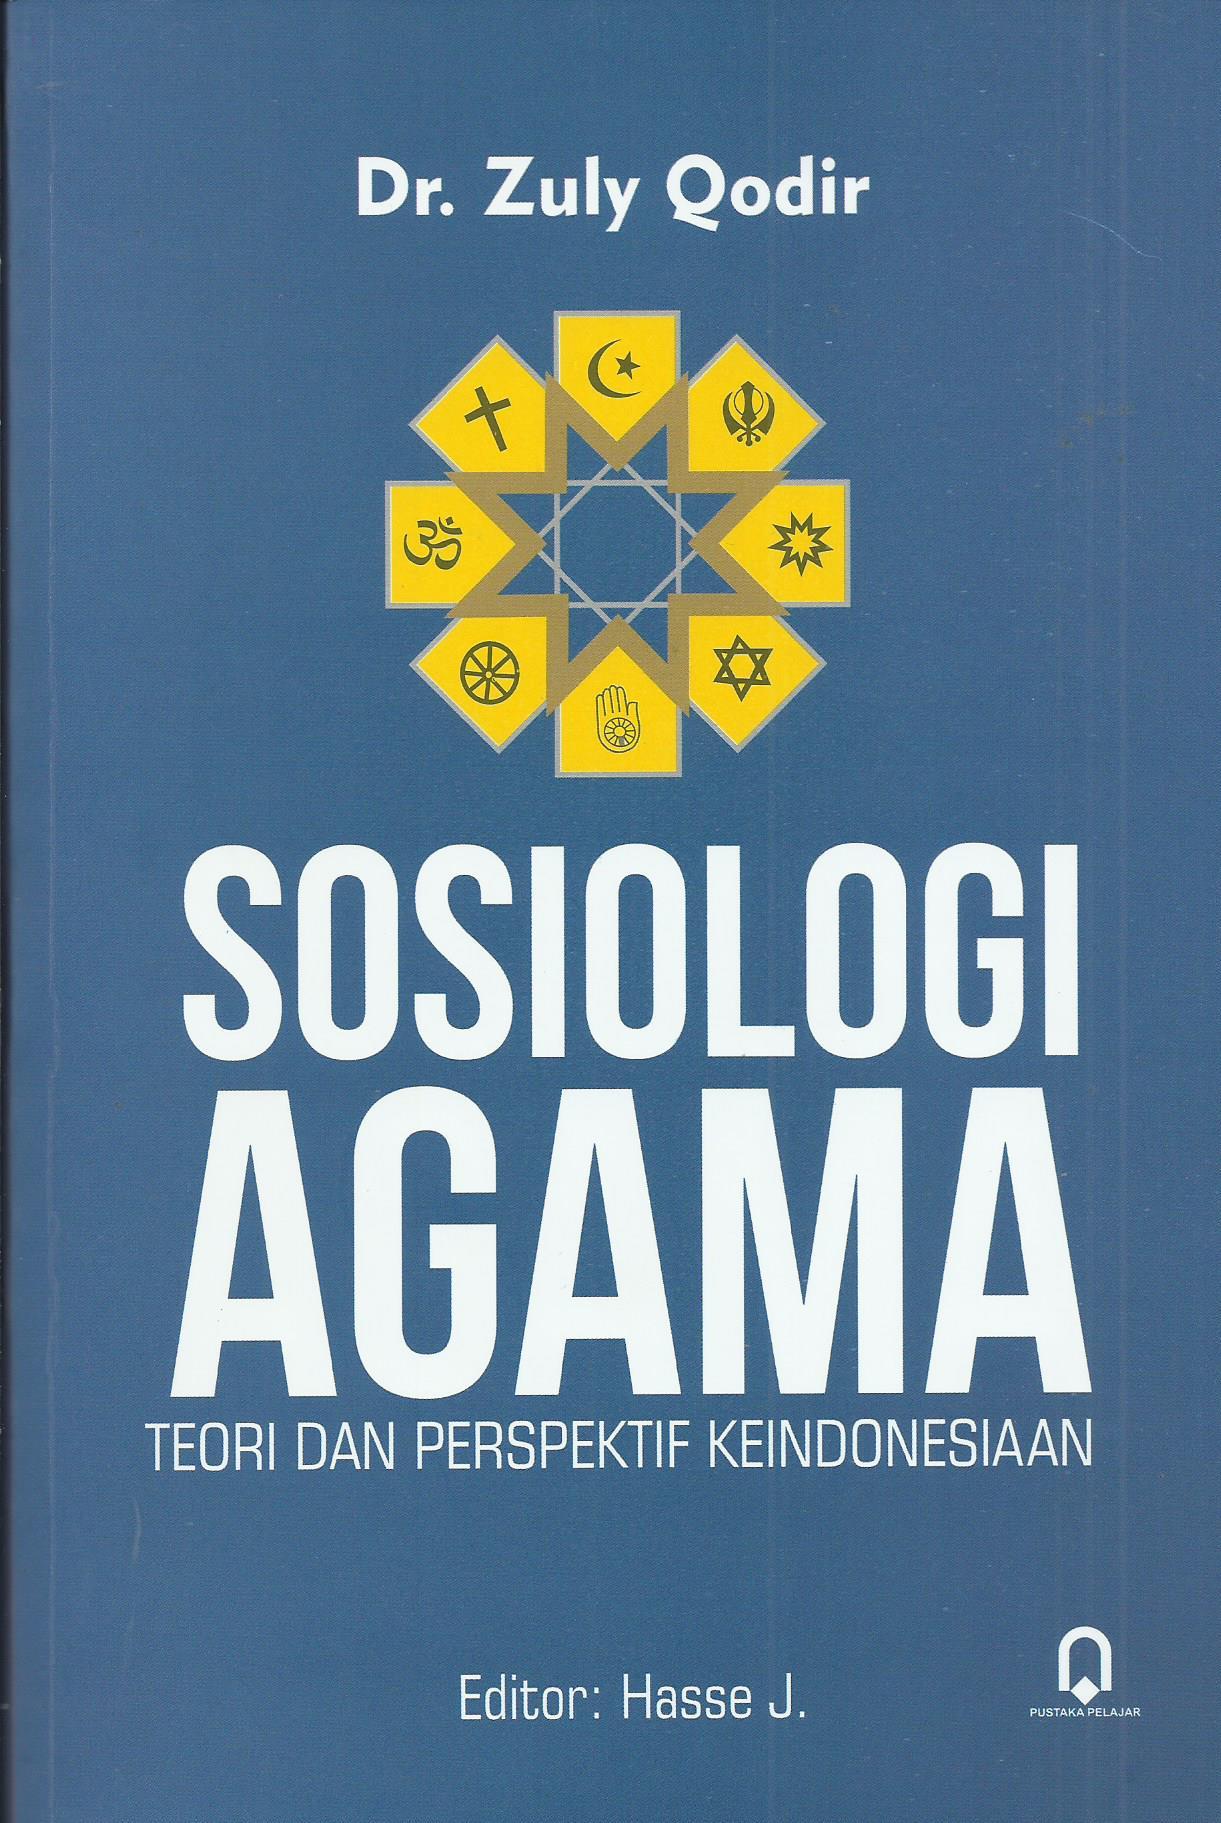 Sosiologi Agama Teori Dan Perspektif Keindonesiaan Pustaka Pelajar